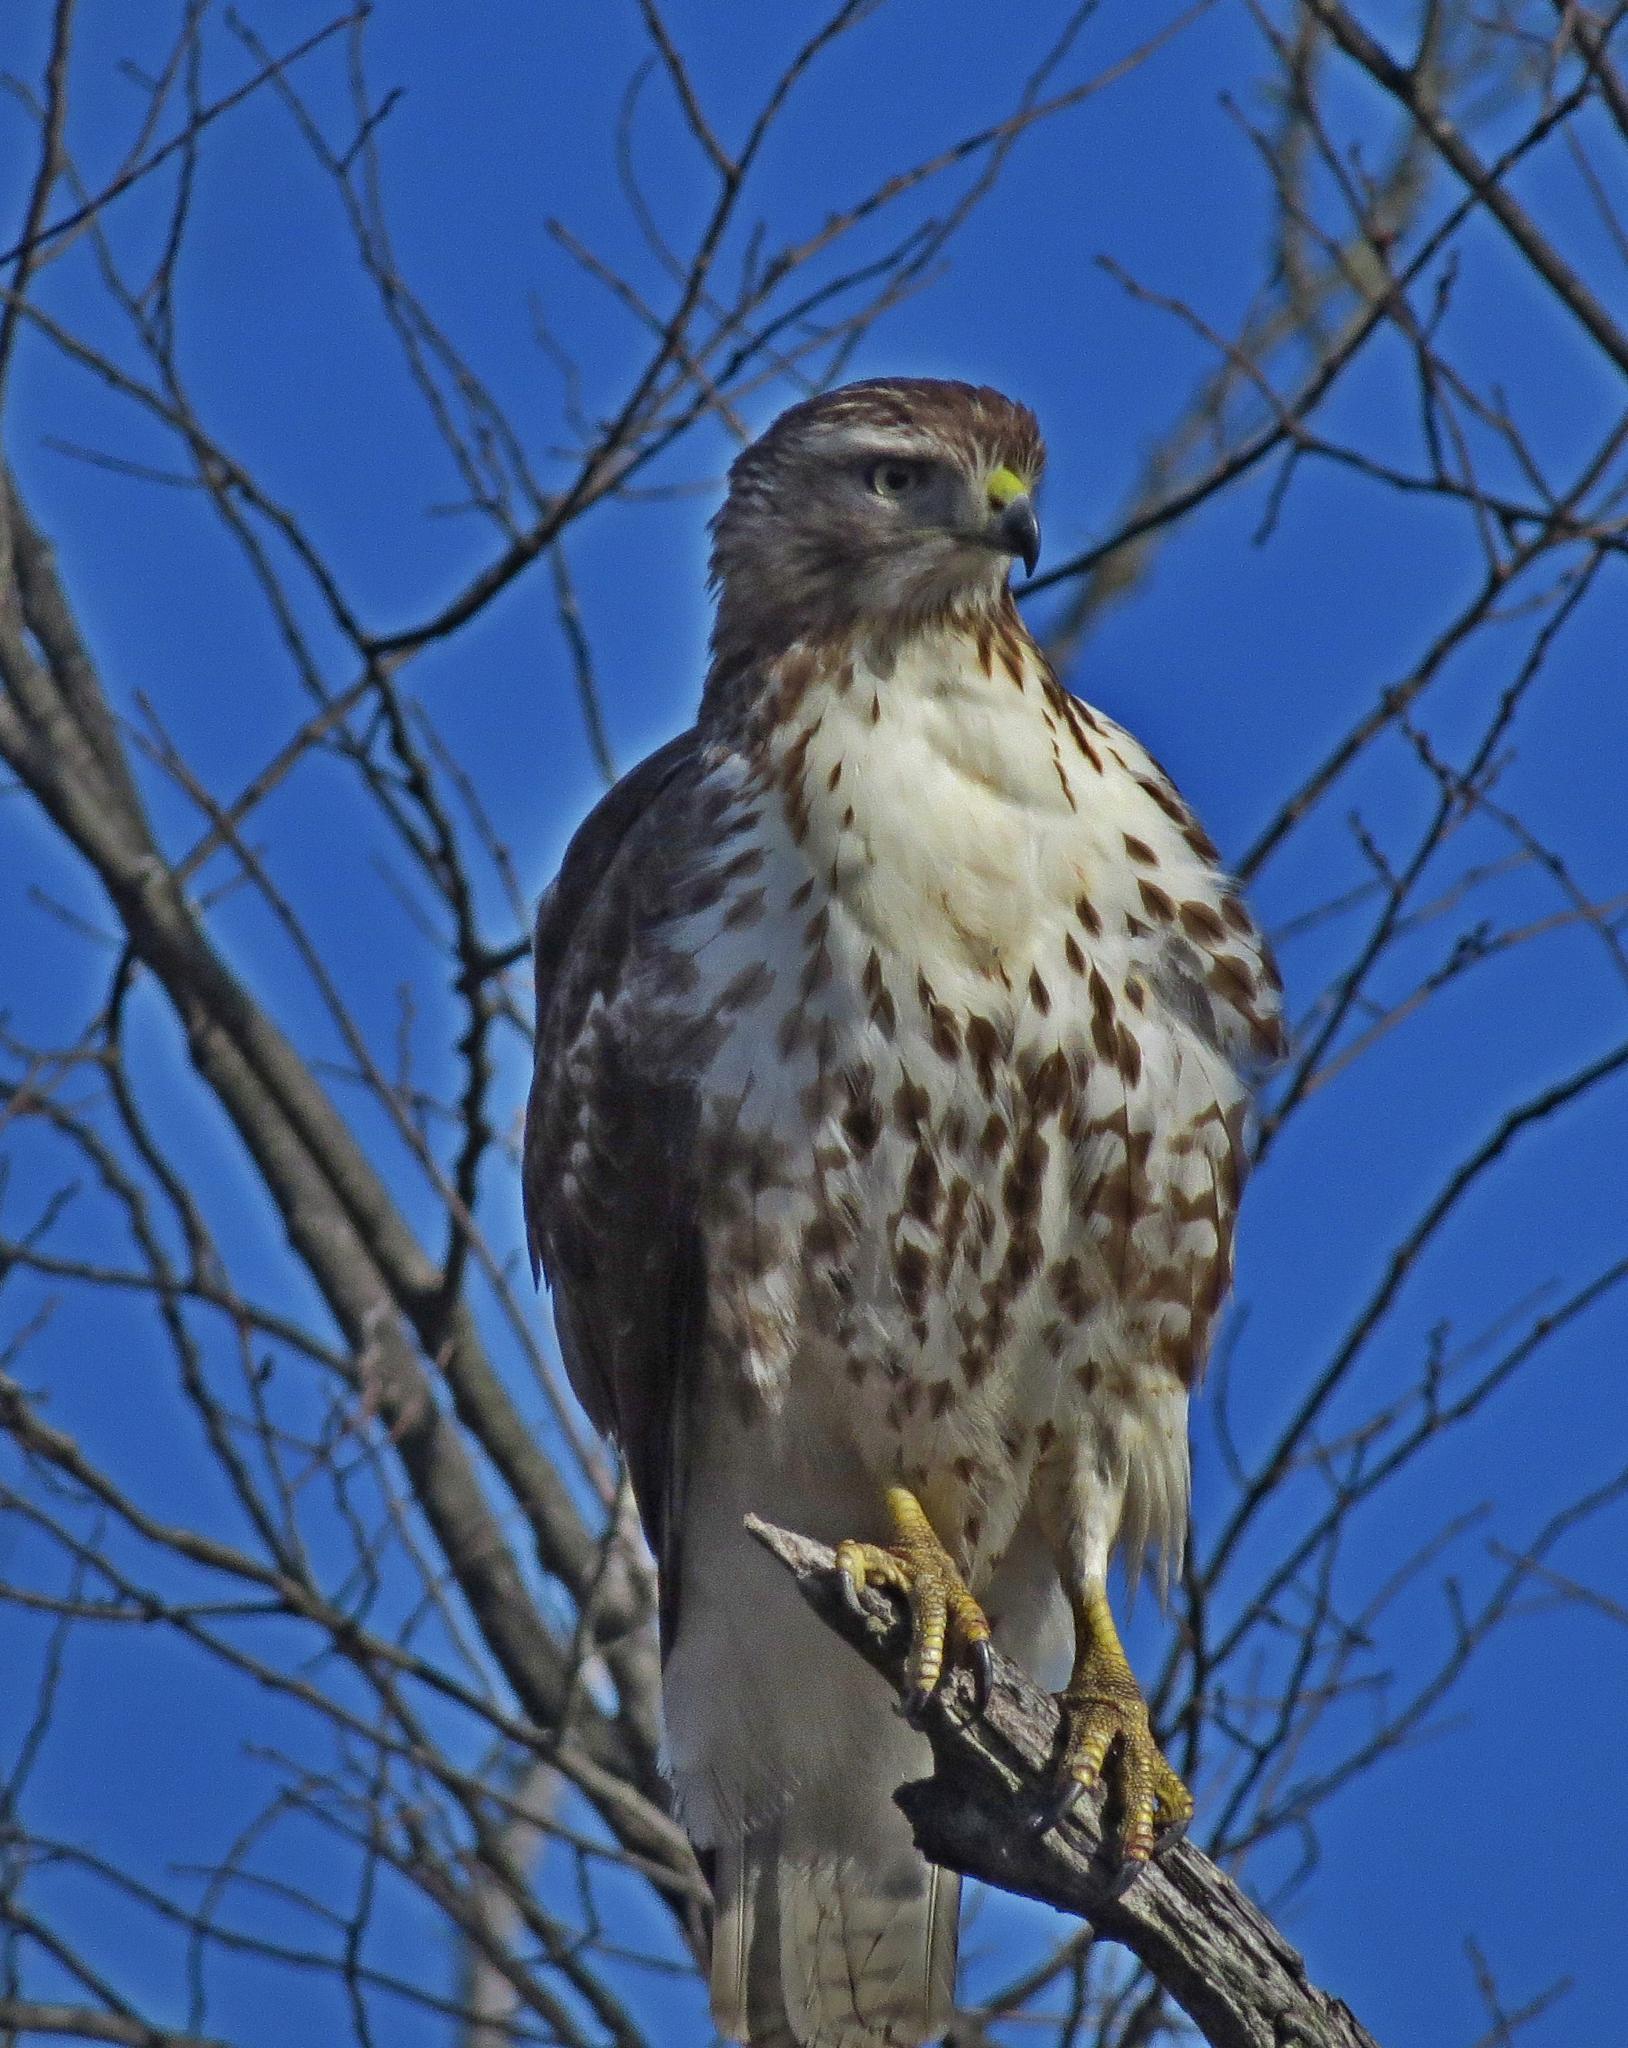 Red Tail Hawk by Wayne T. 'tom' Helfrich